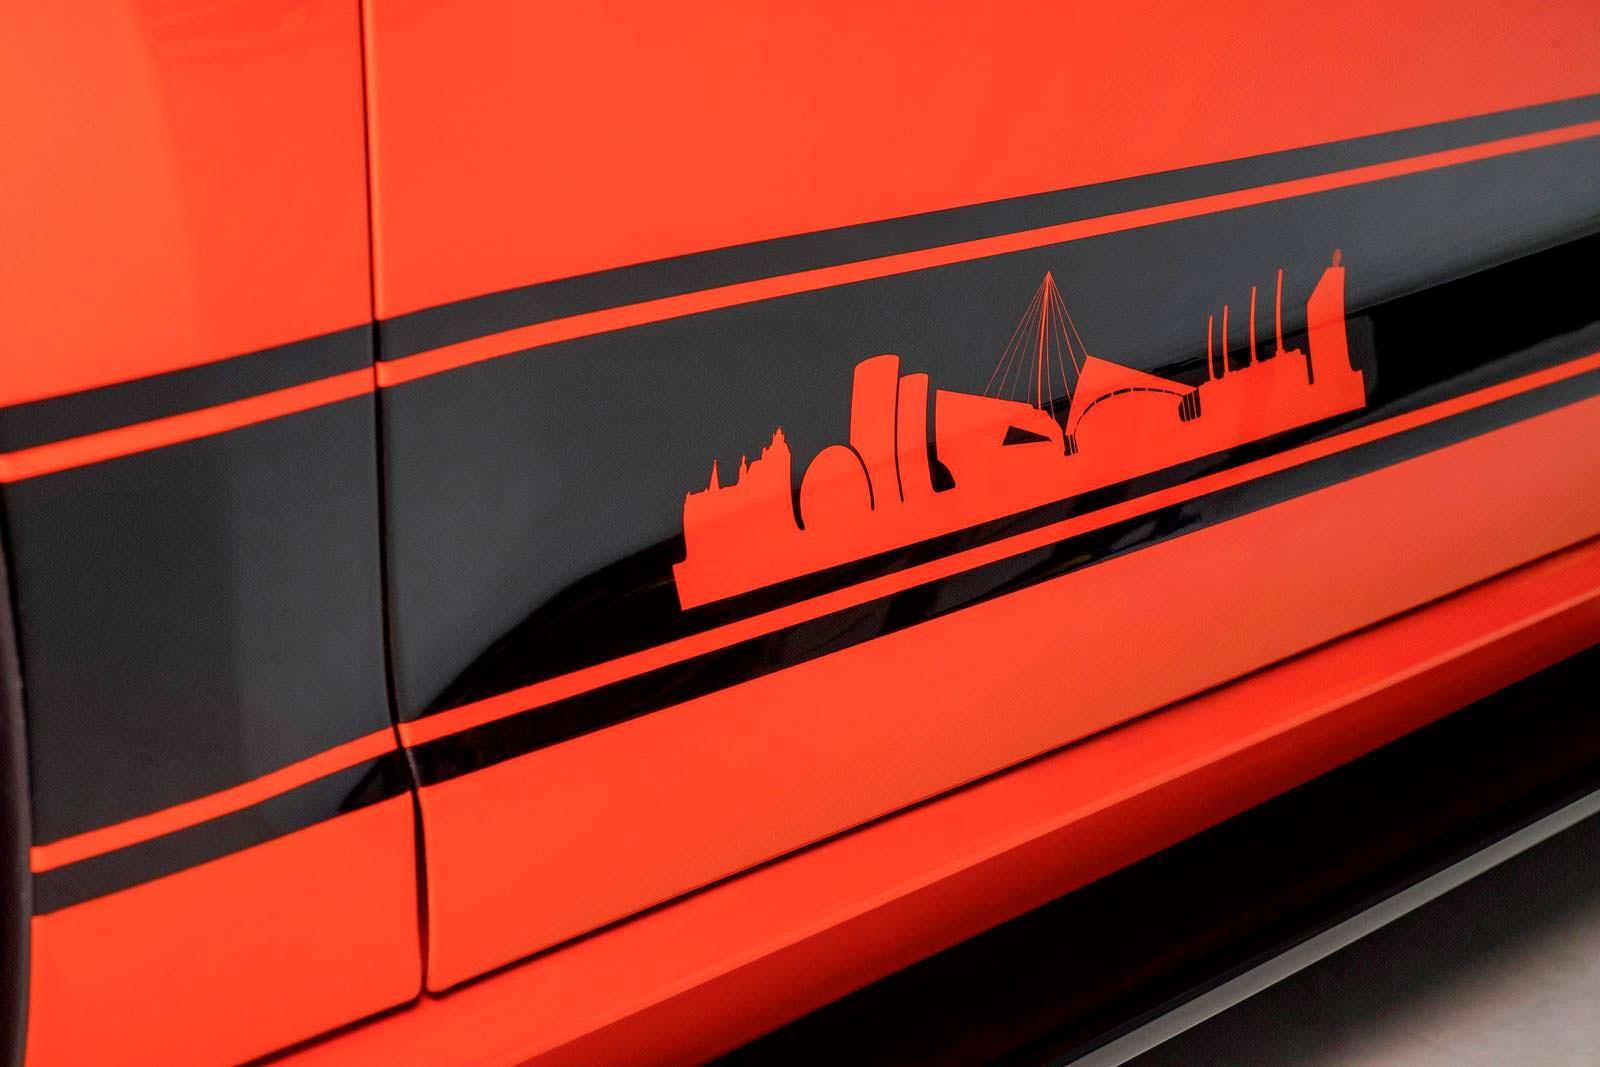 Узор на двери VW Golf GTI Wolfsburg Edition